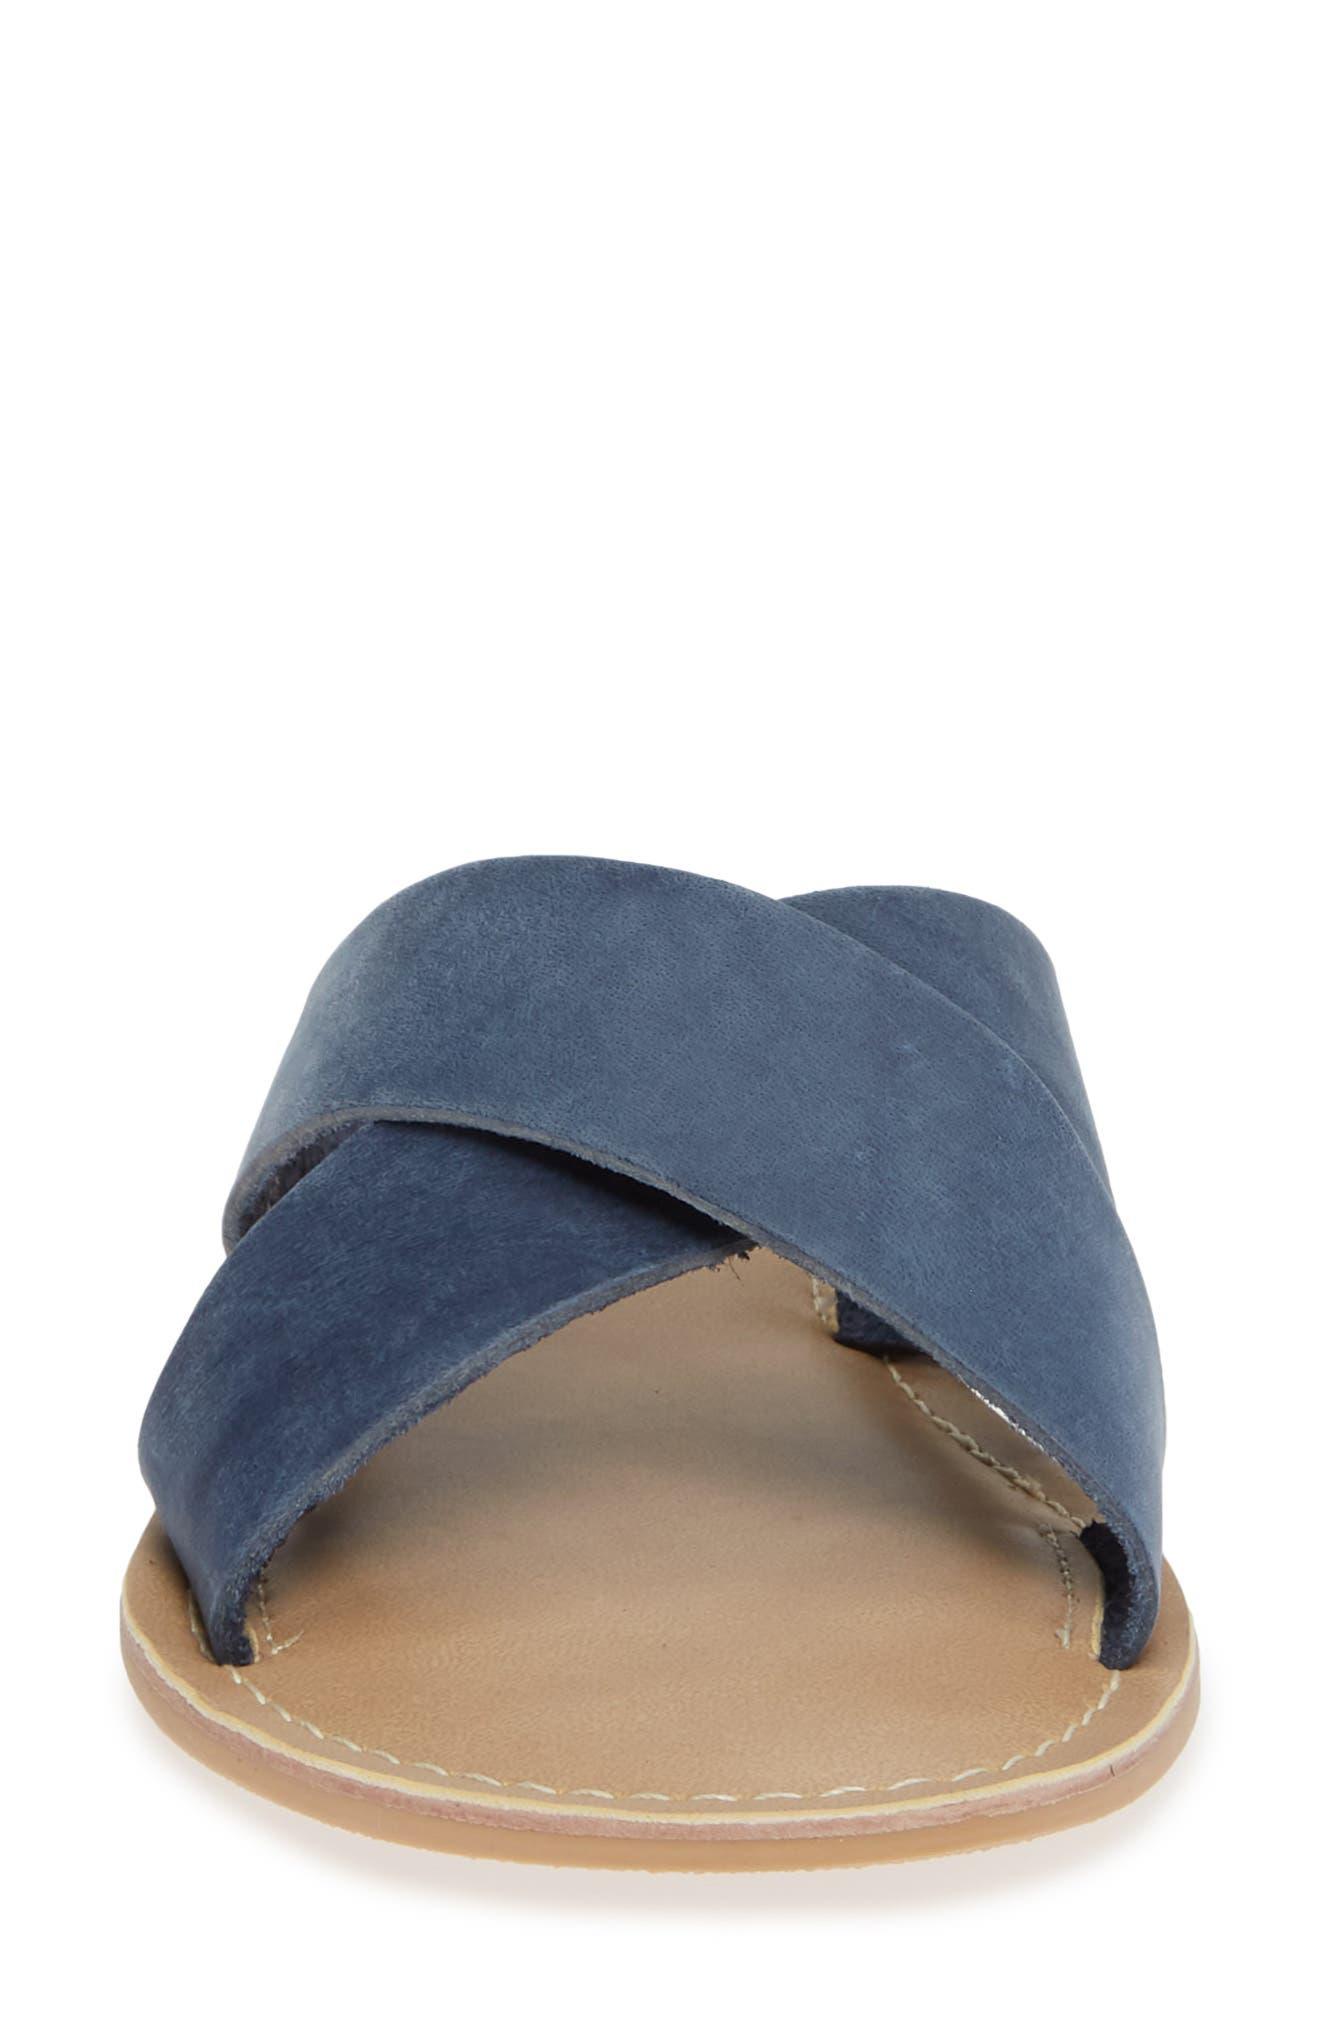 COCONUTS BY MATISSE, Pebble Slide Sandal, Alternate thumbnail 4, color, BLUE NUBUCK LEATHER